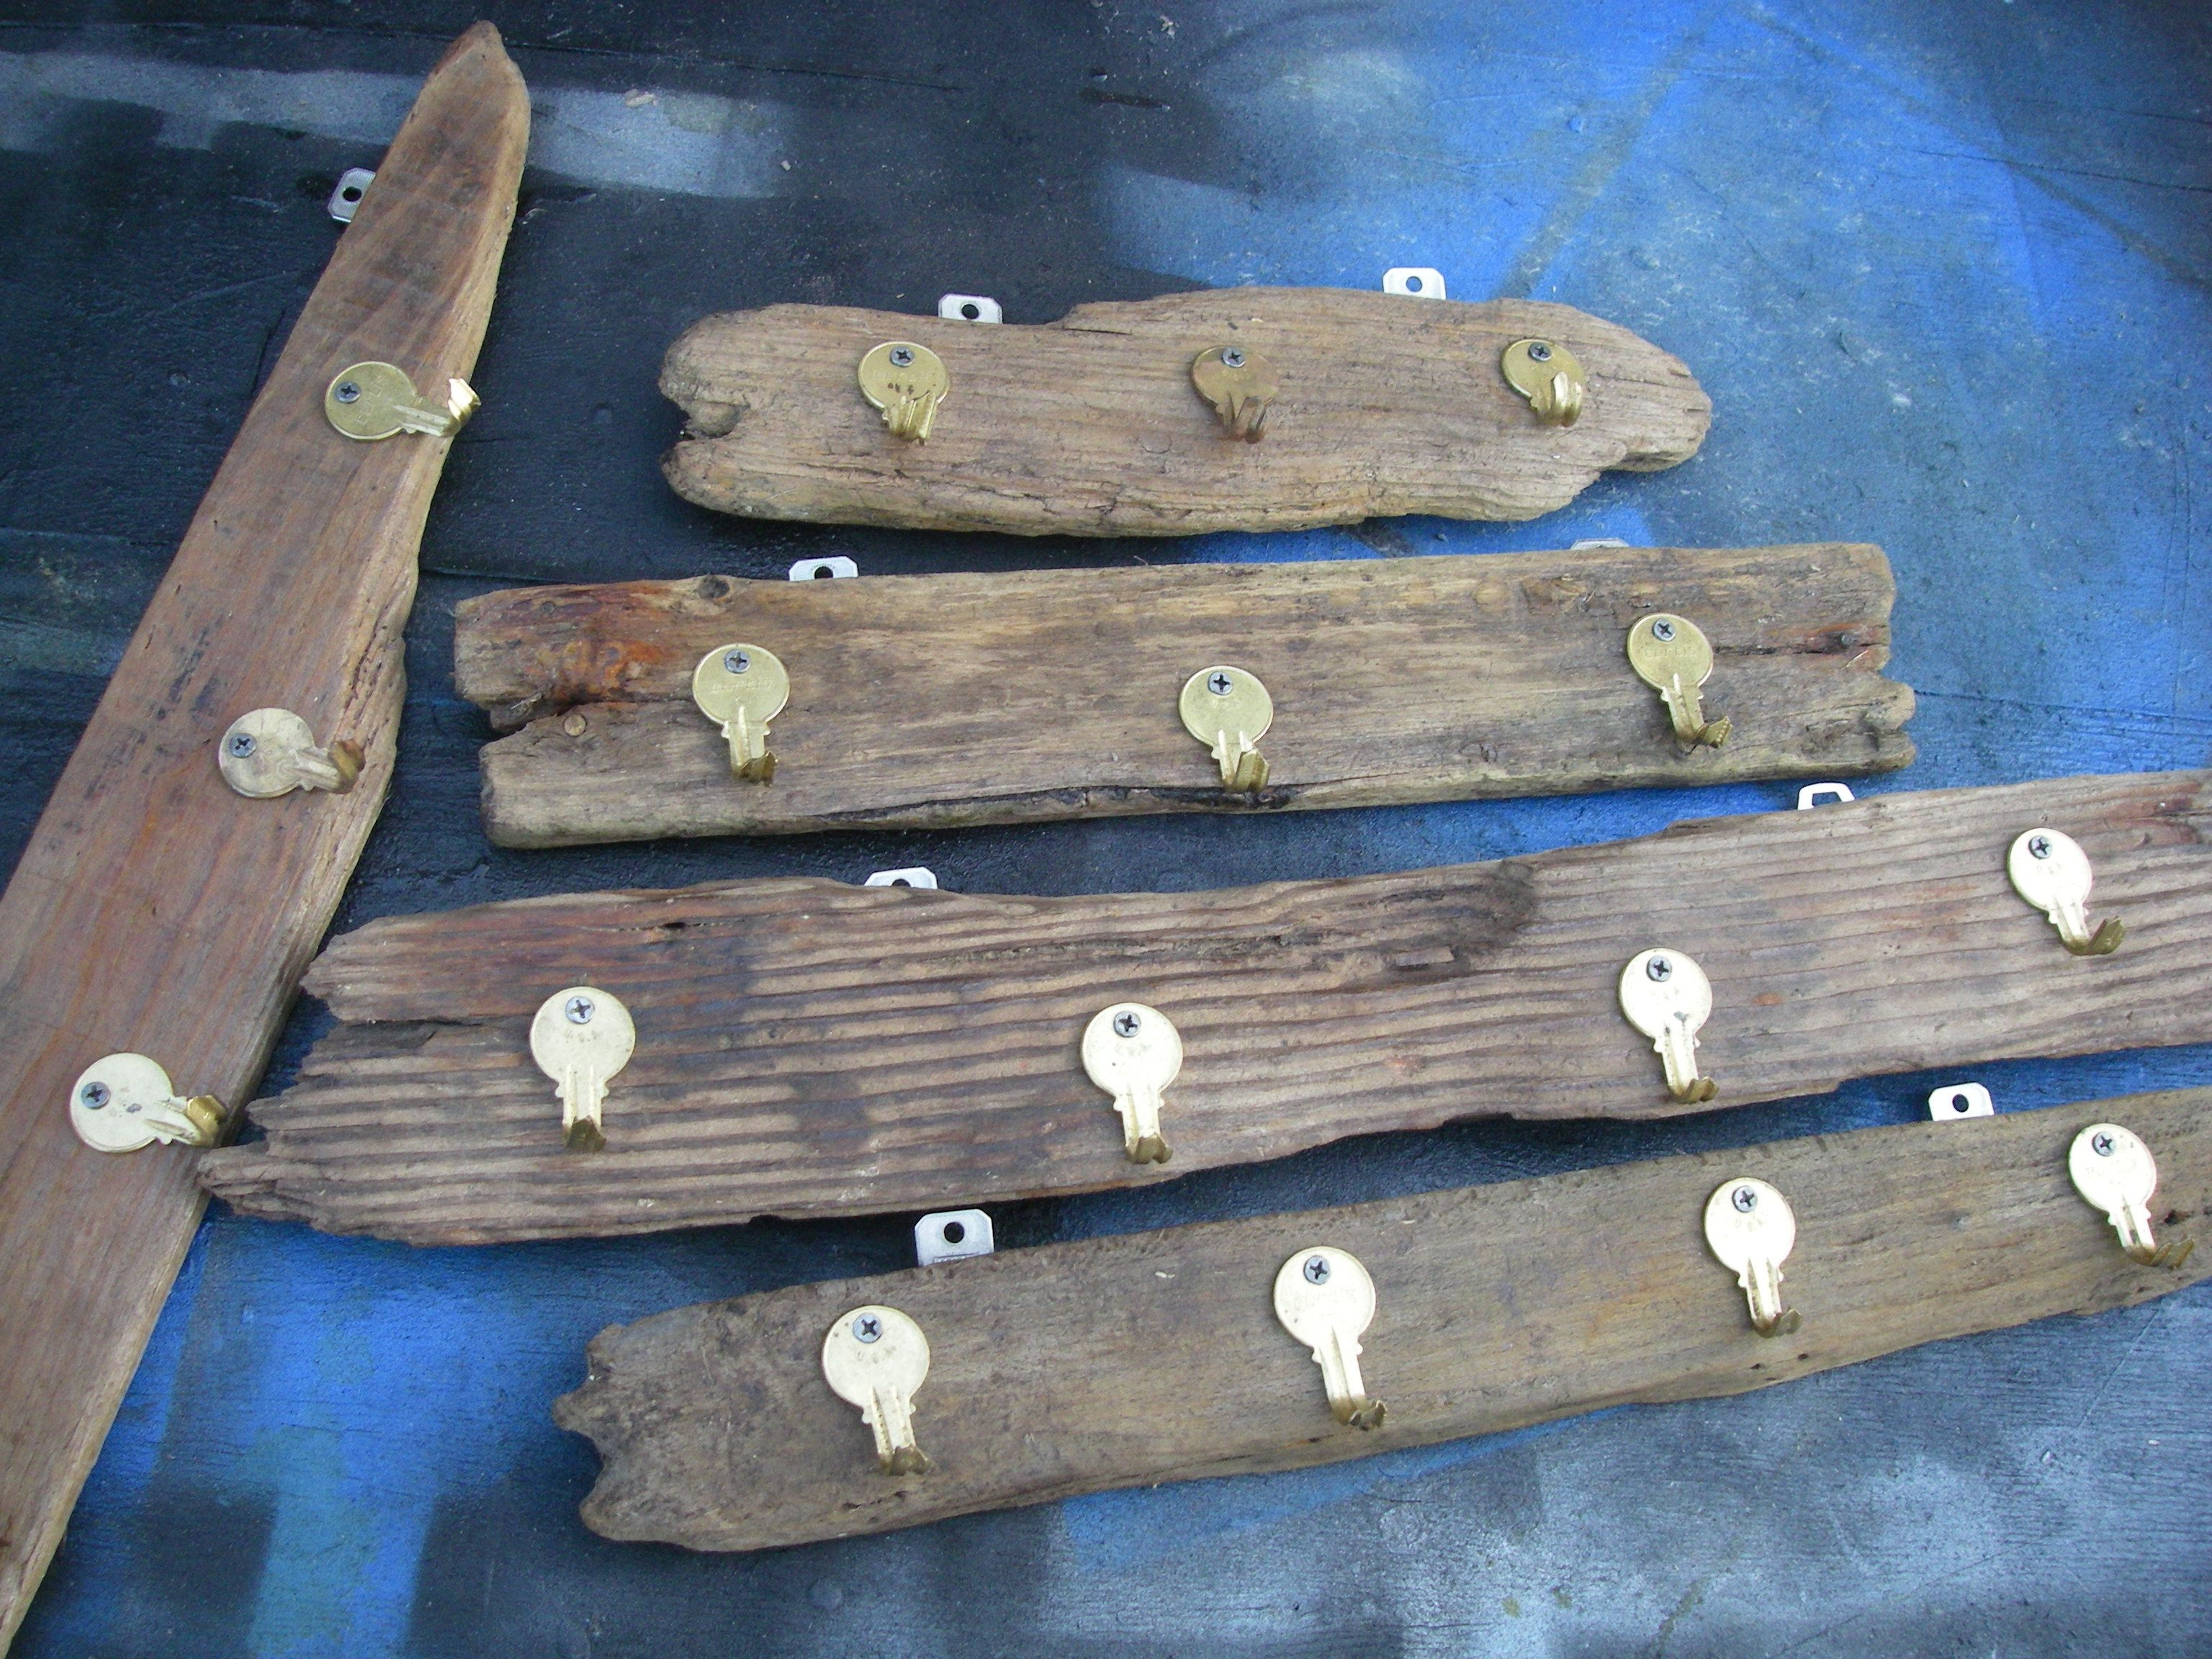 Driftwood Key Hooks With Keys For Hooks And Hangers #Driftwood